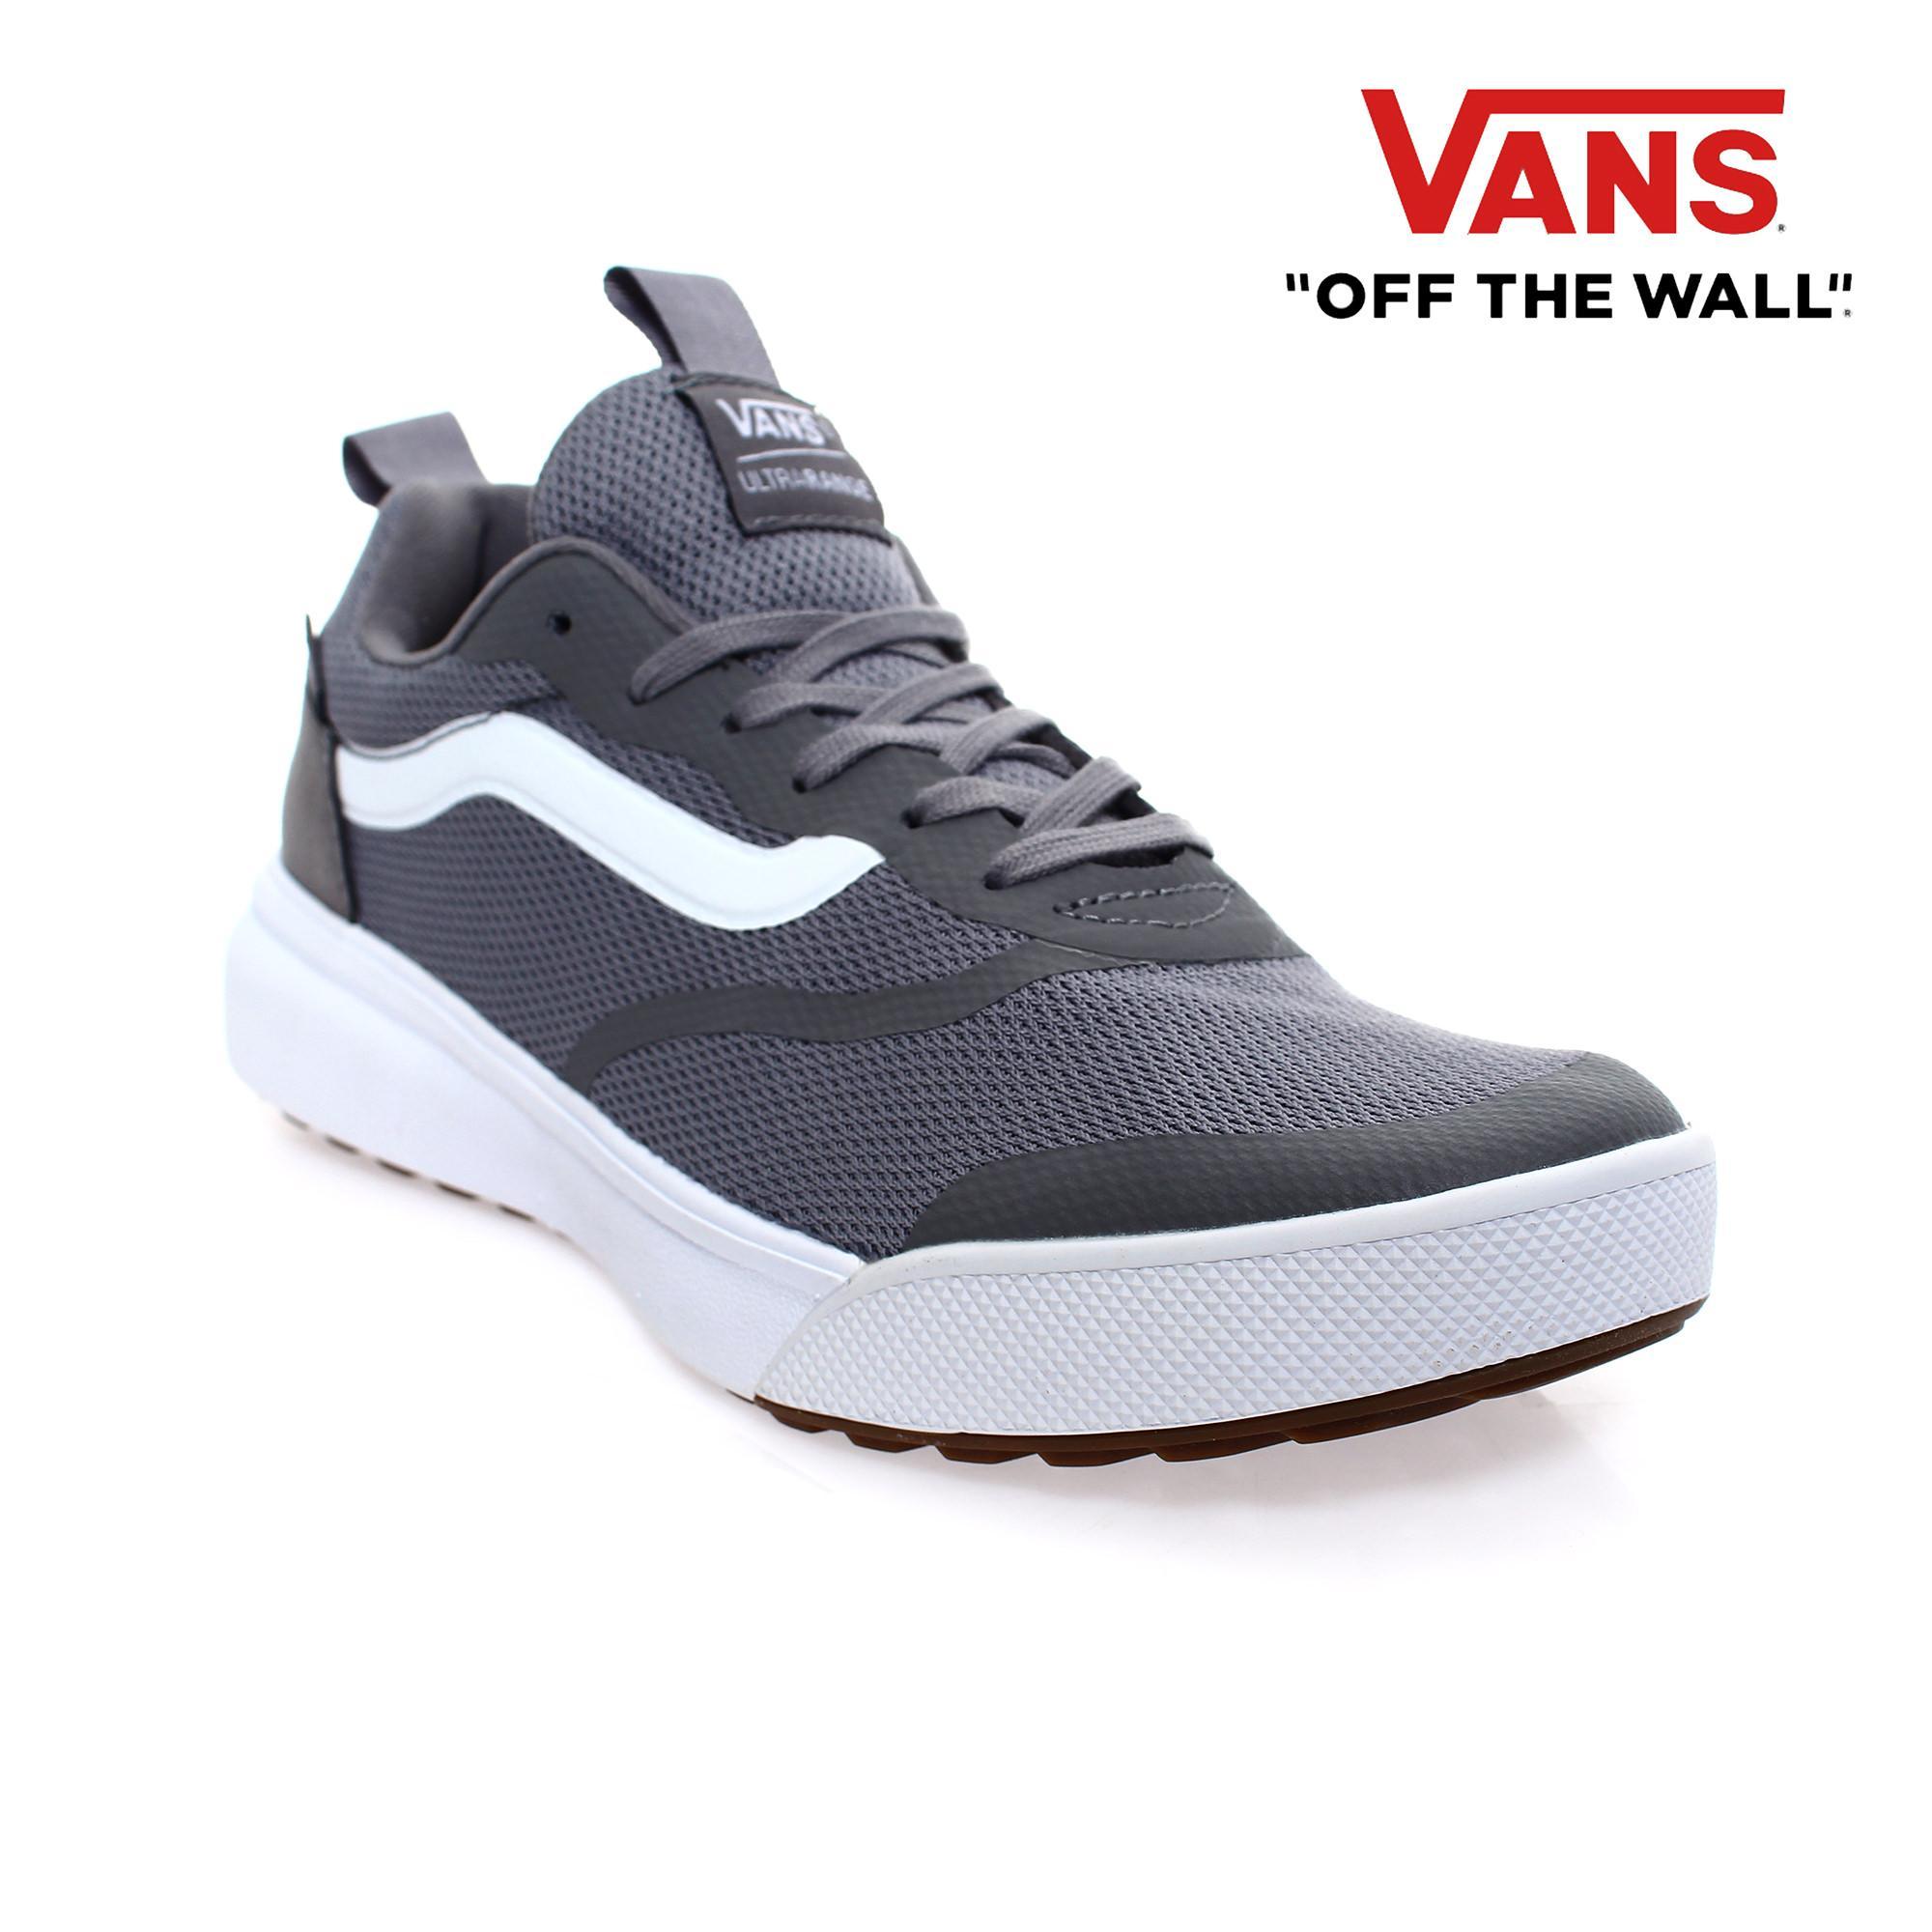 6f7cfab17baa4f Vans Shoes for Men Philippines - Vans Men s Shoes for sale - prices ...